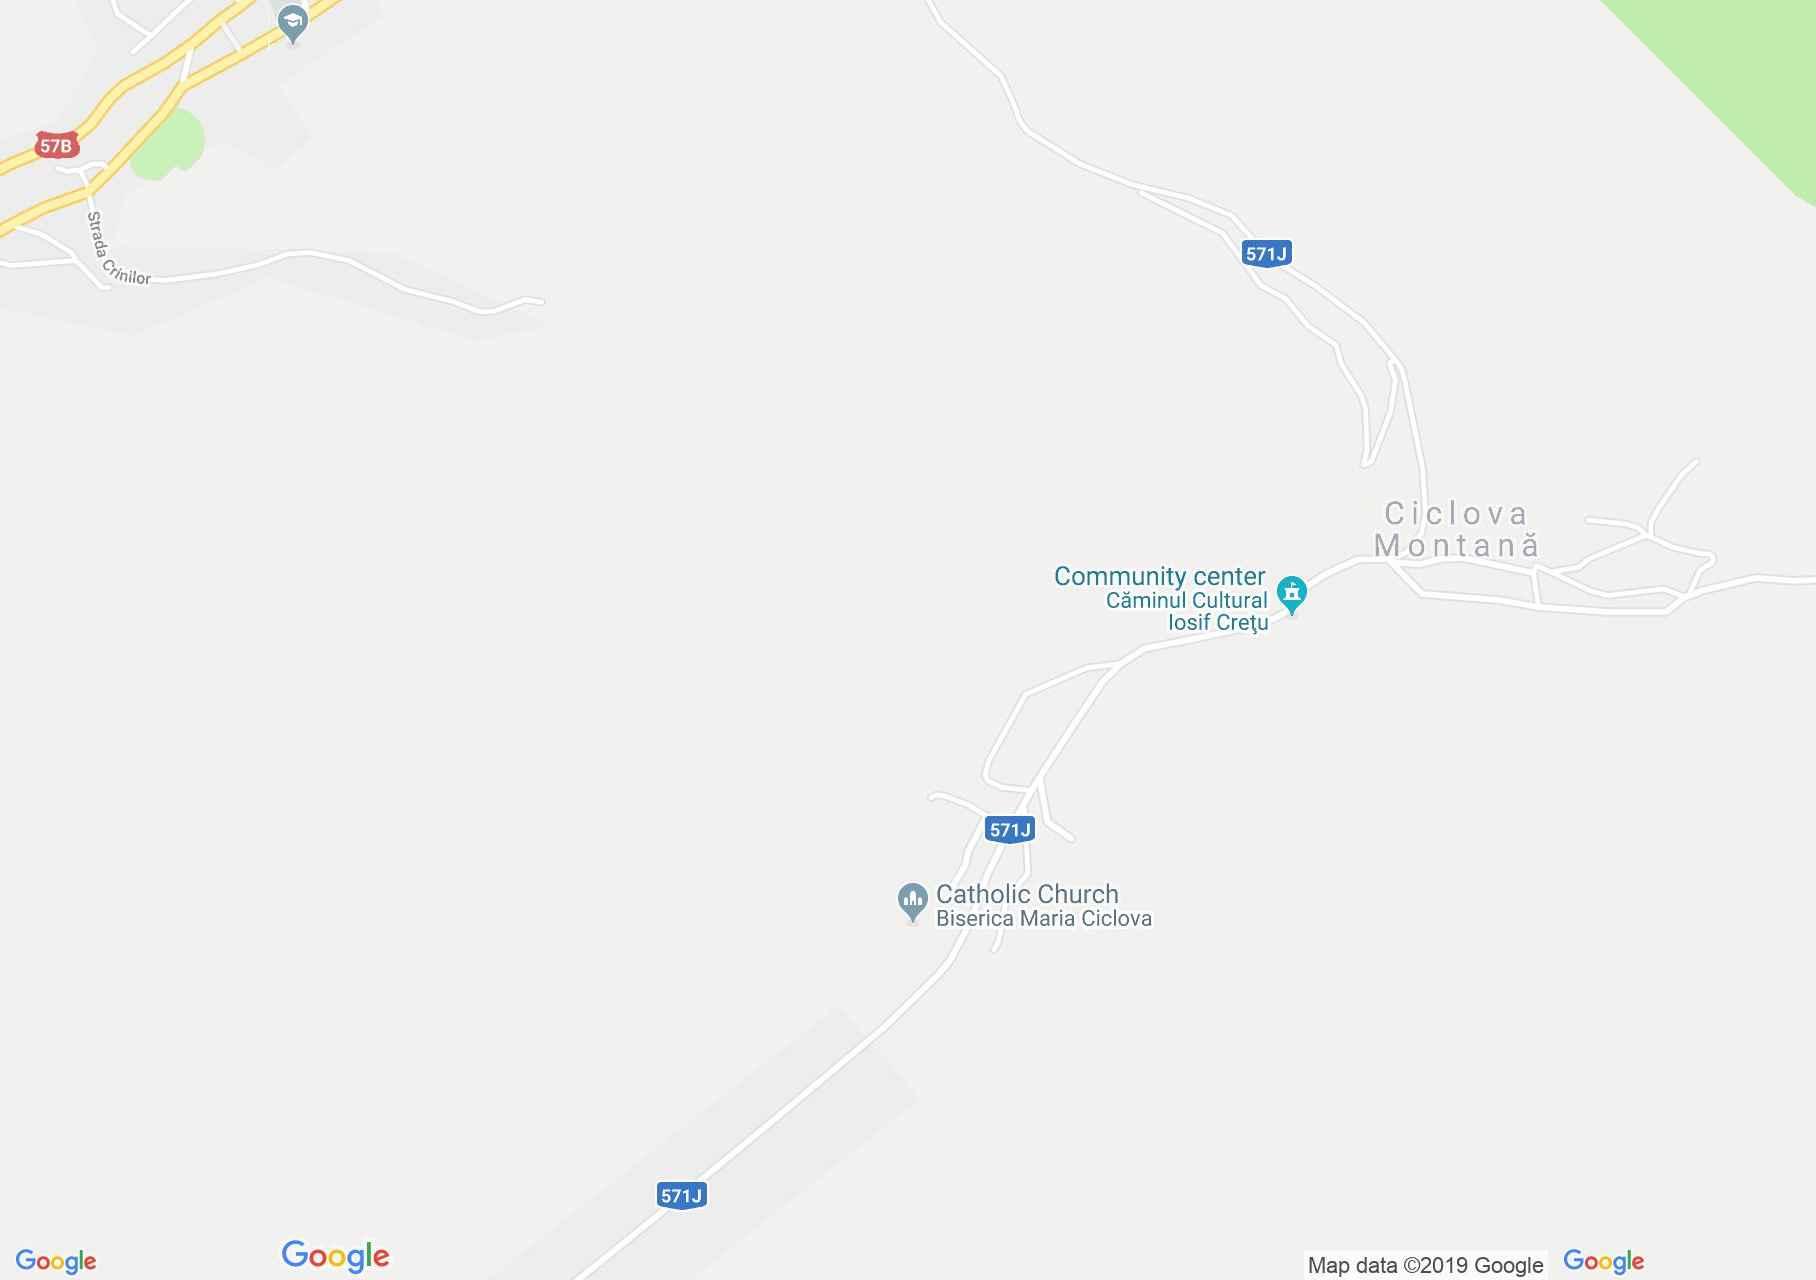 Map of Ciclova Montană: Ciclova Montană, Catholic Church